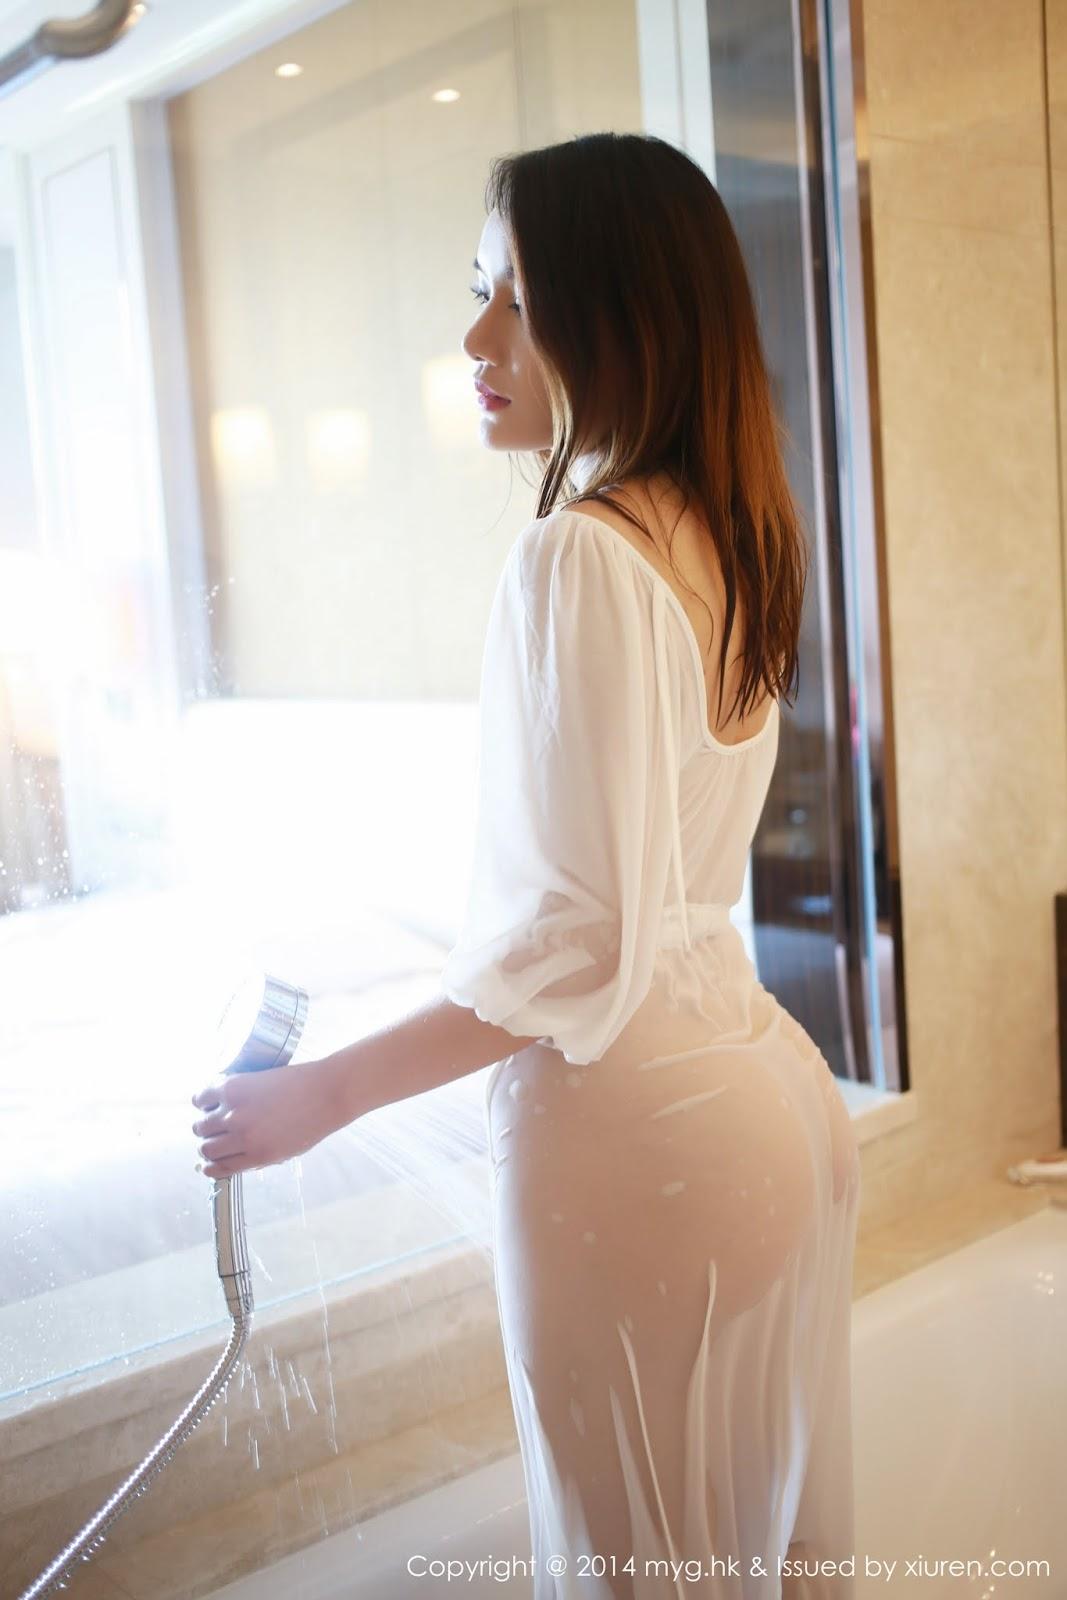 0037 - Beautiful Naked Girl Model MYGIRL VOL.35